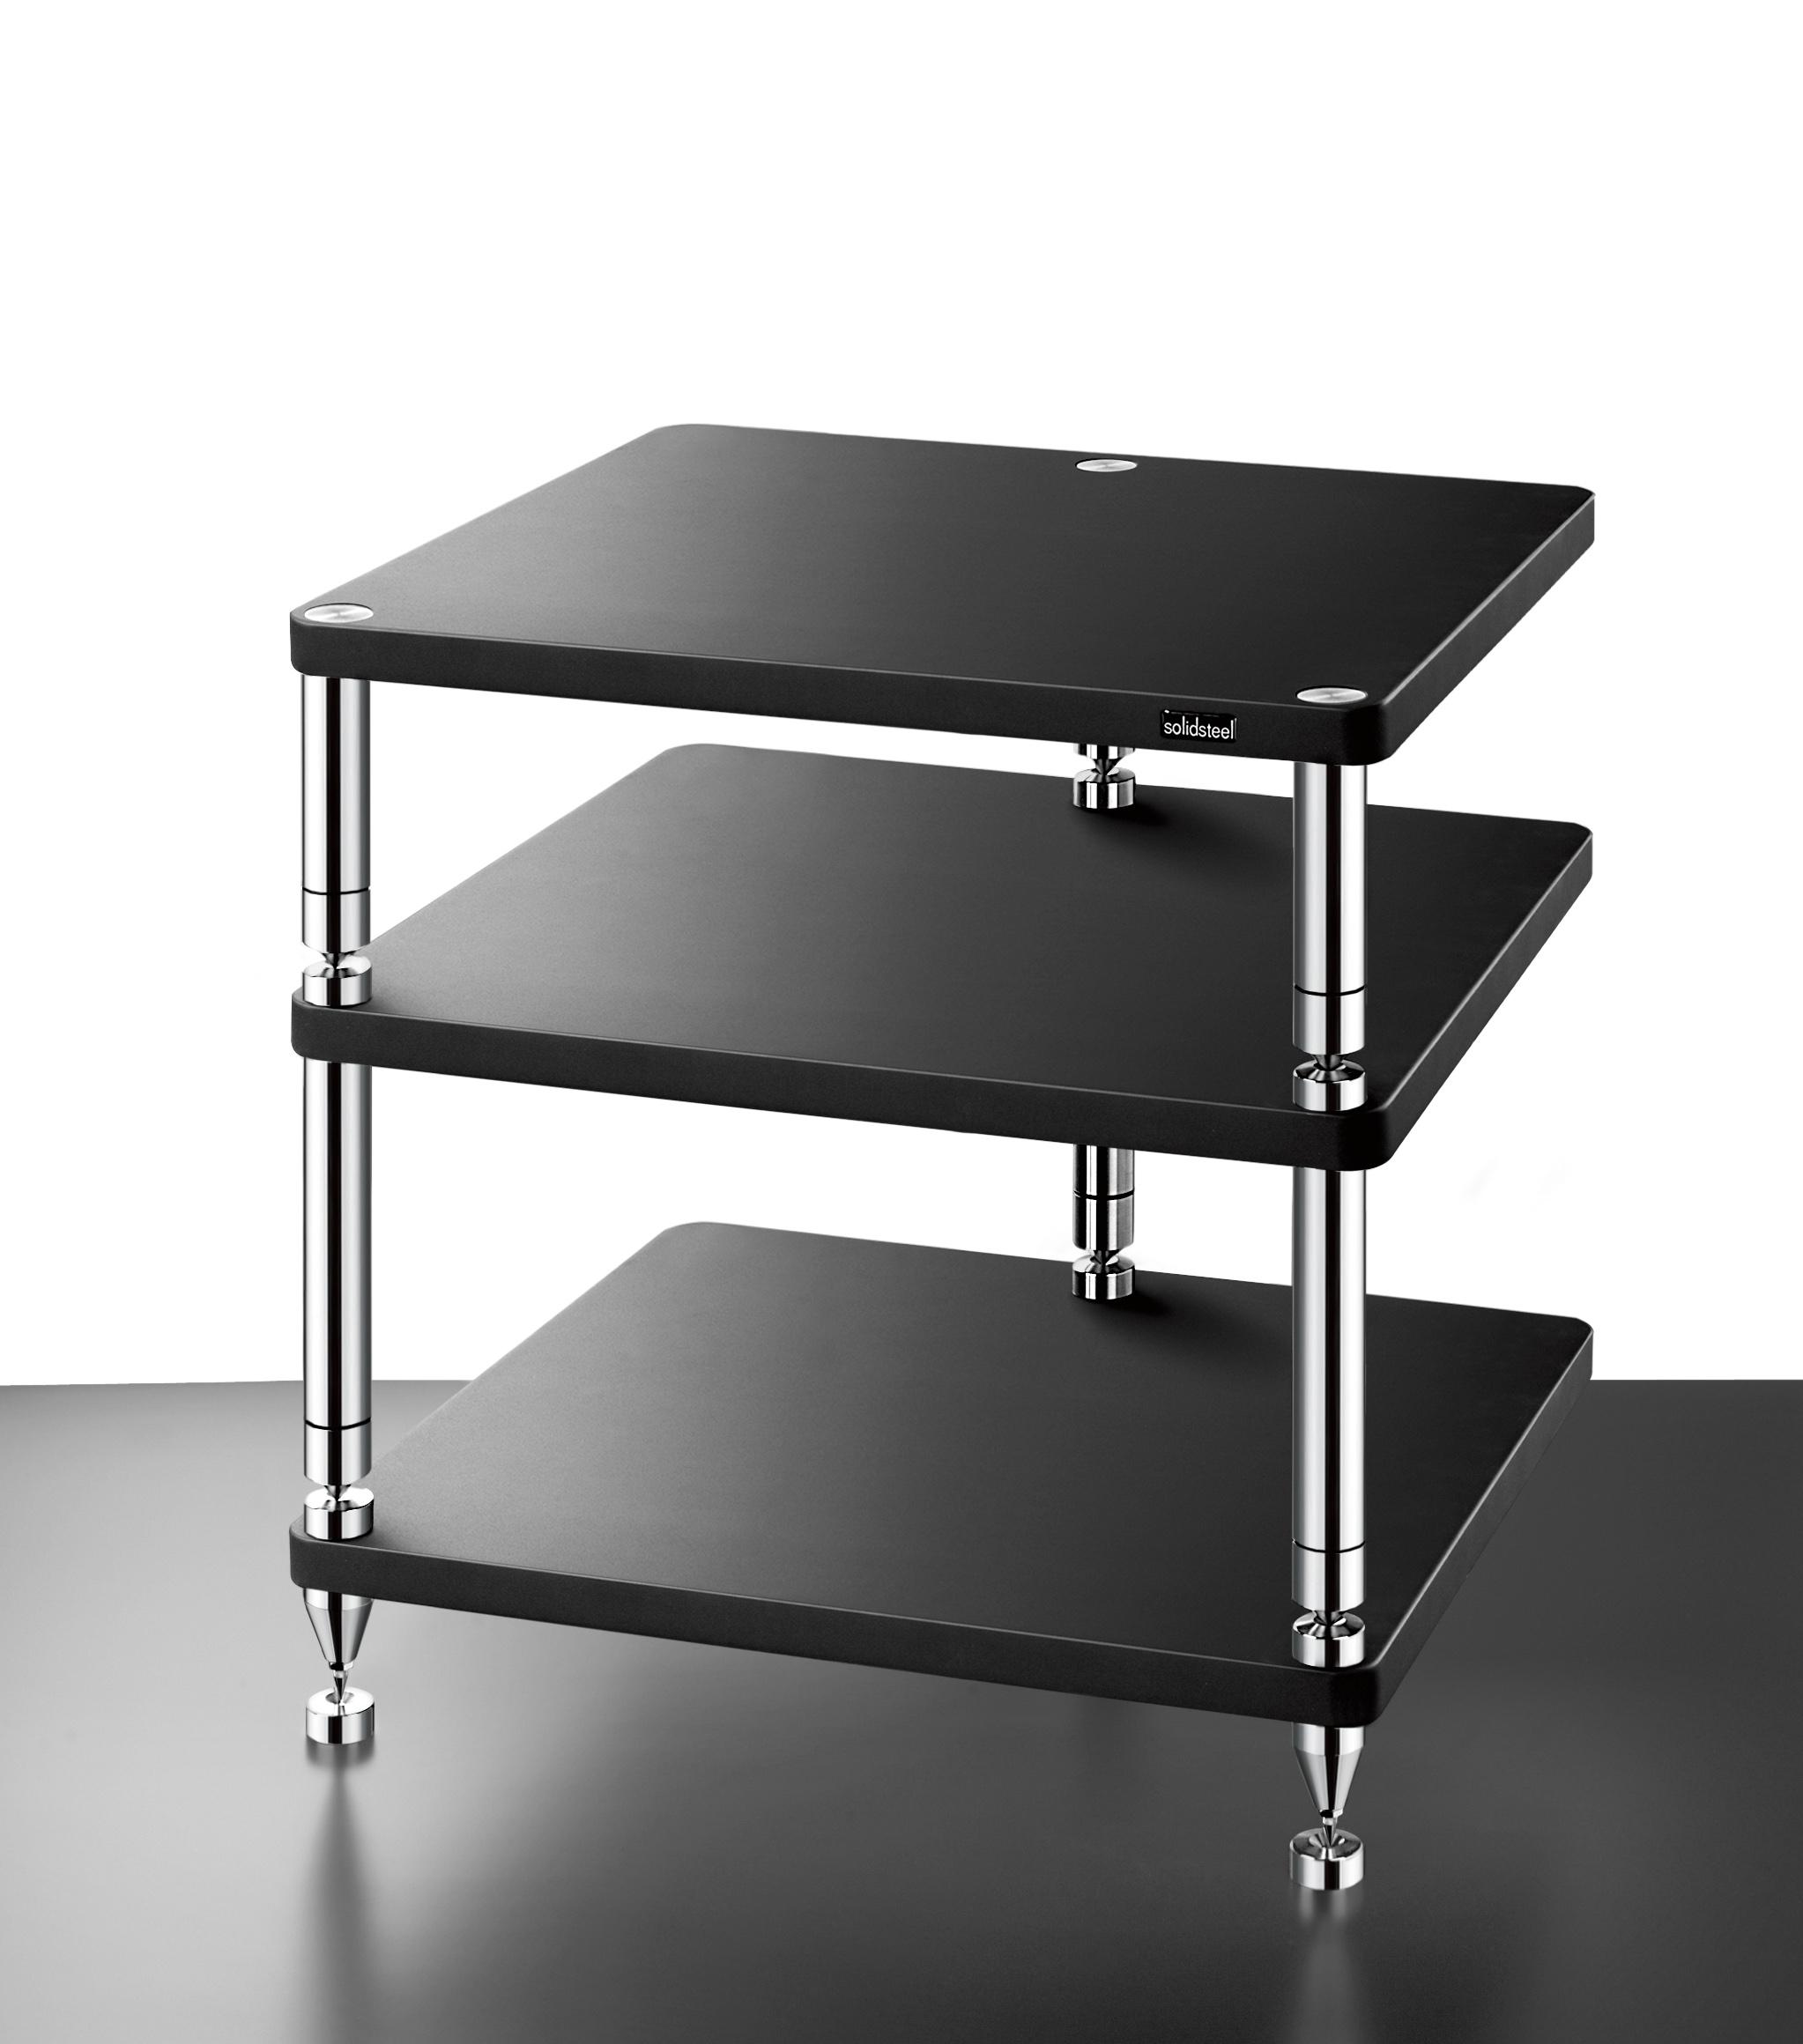 rack inch shelf depth shelves components